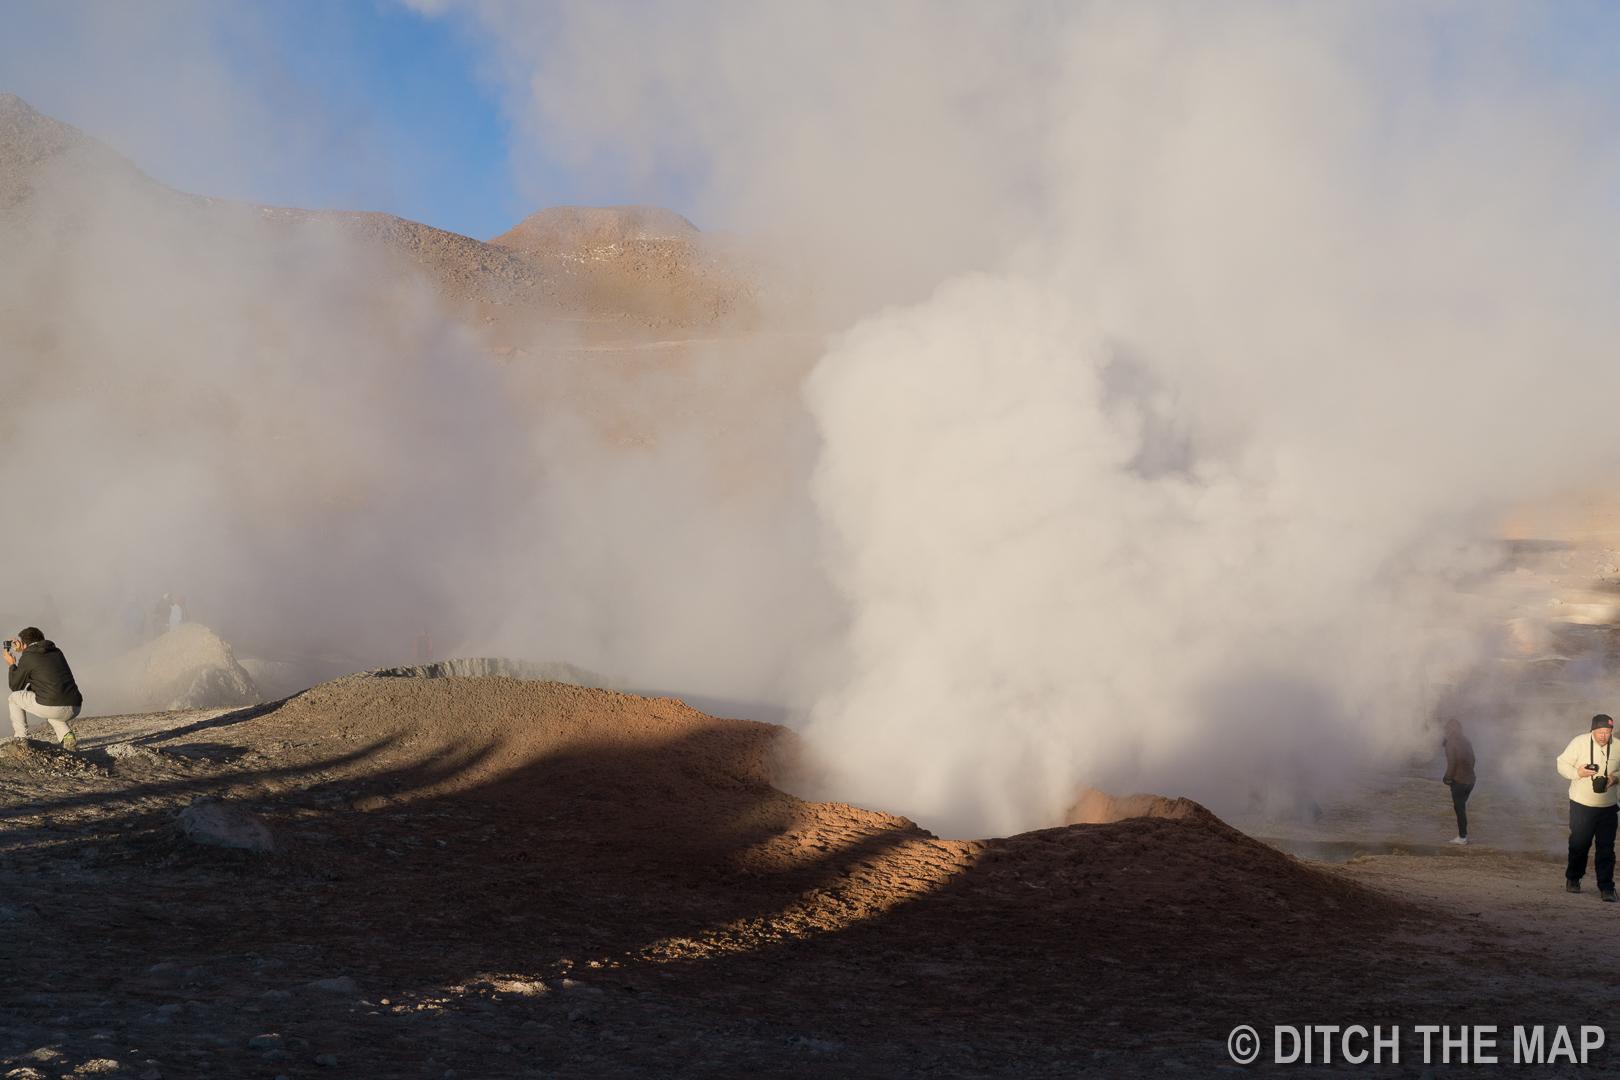 Solar de Manaña geyser basin in Bolivia